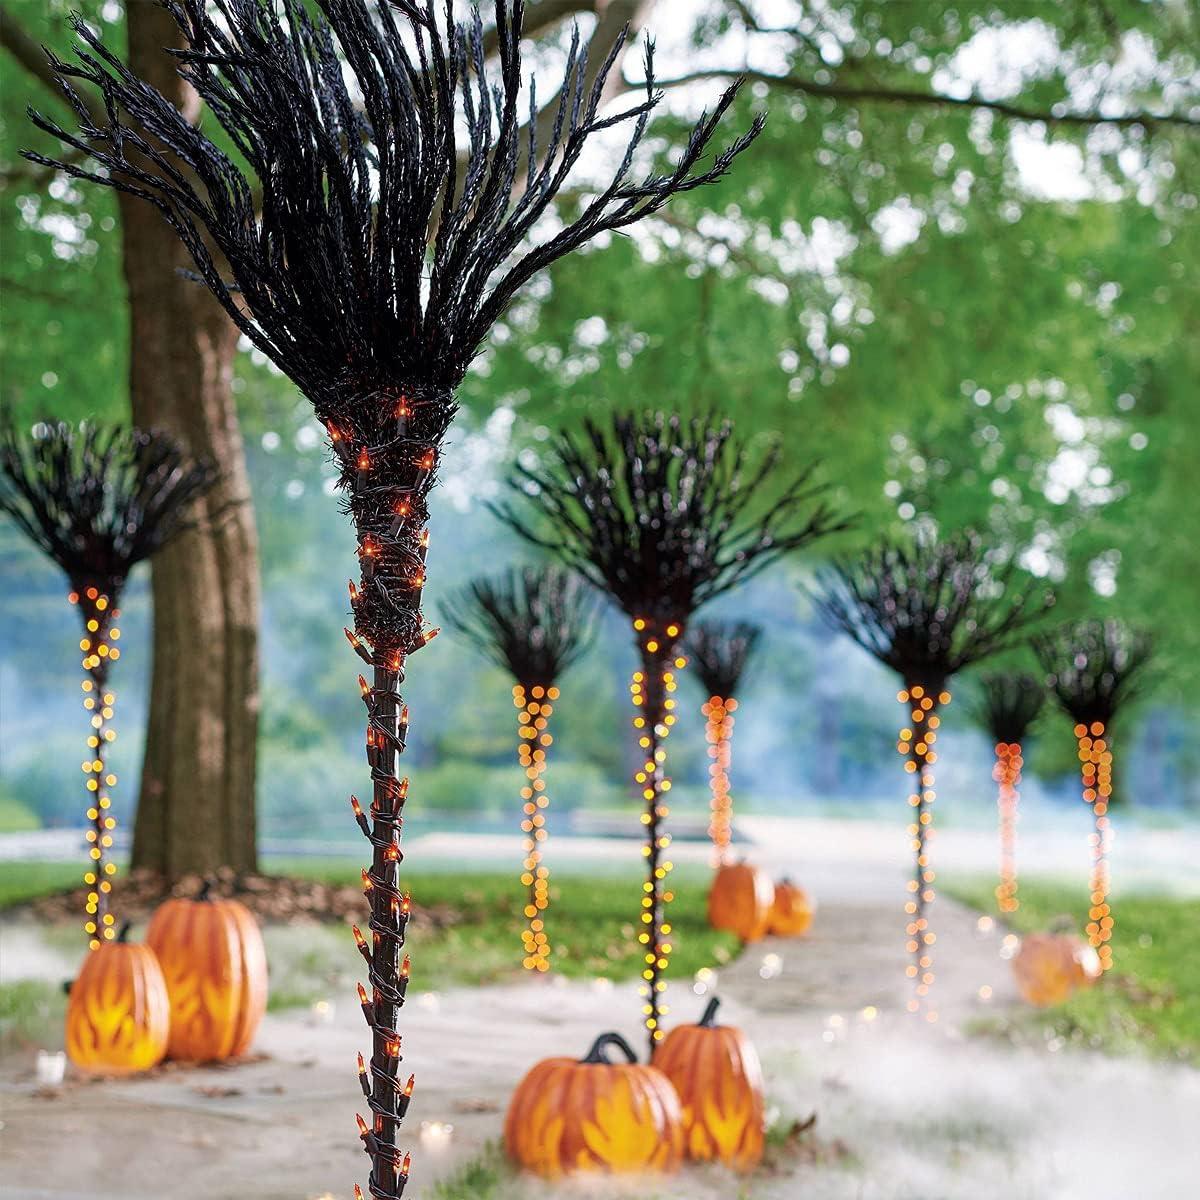 Tenacitee Halloween Pre-Lit Broomstick Spooky Lu Pathway Markers New Limited price sale mail order